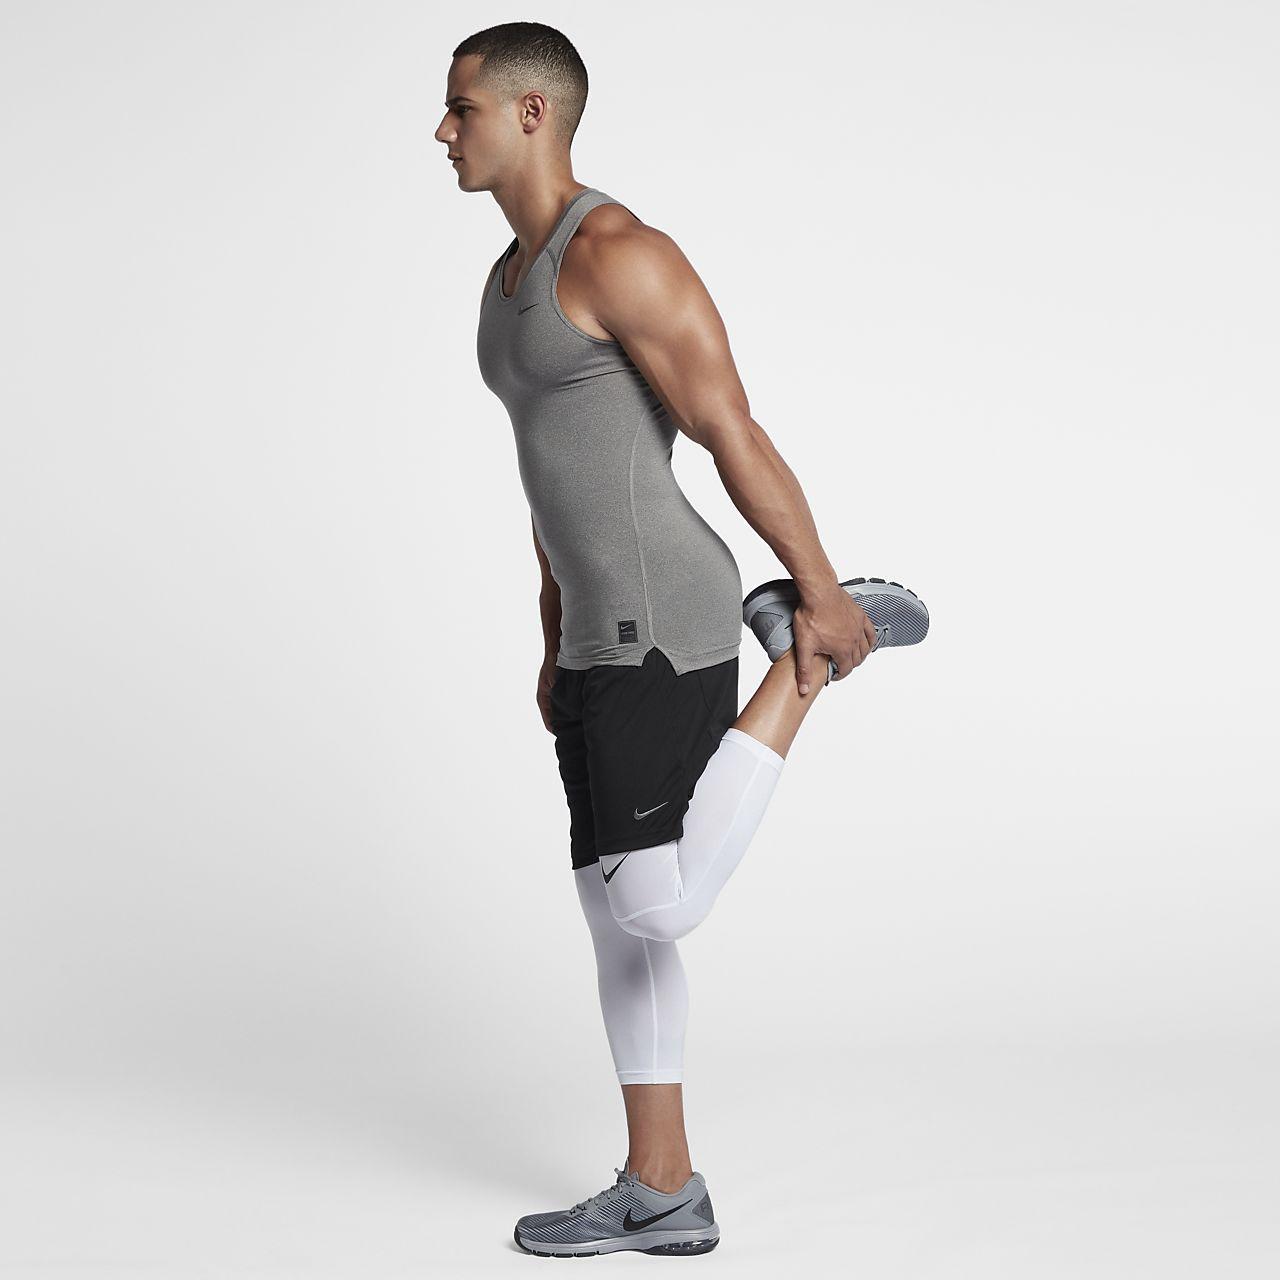 nike 3/4 training pants